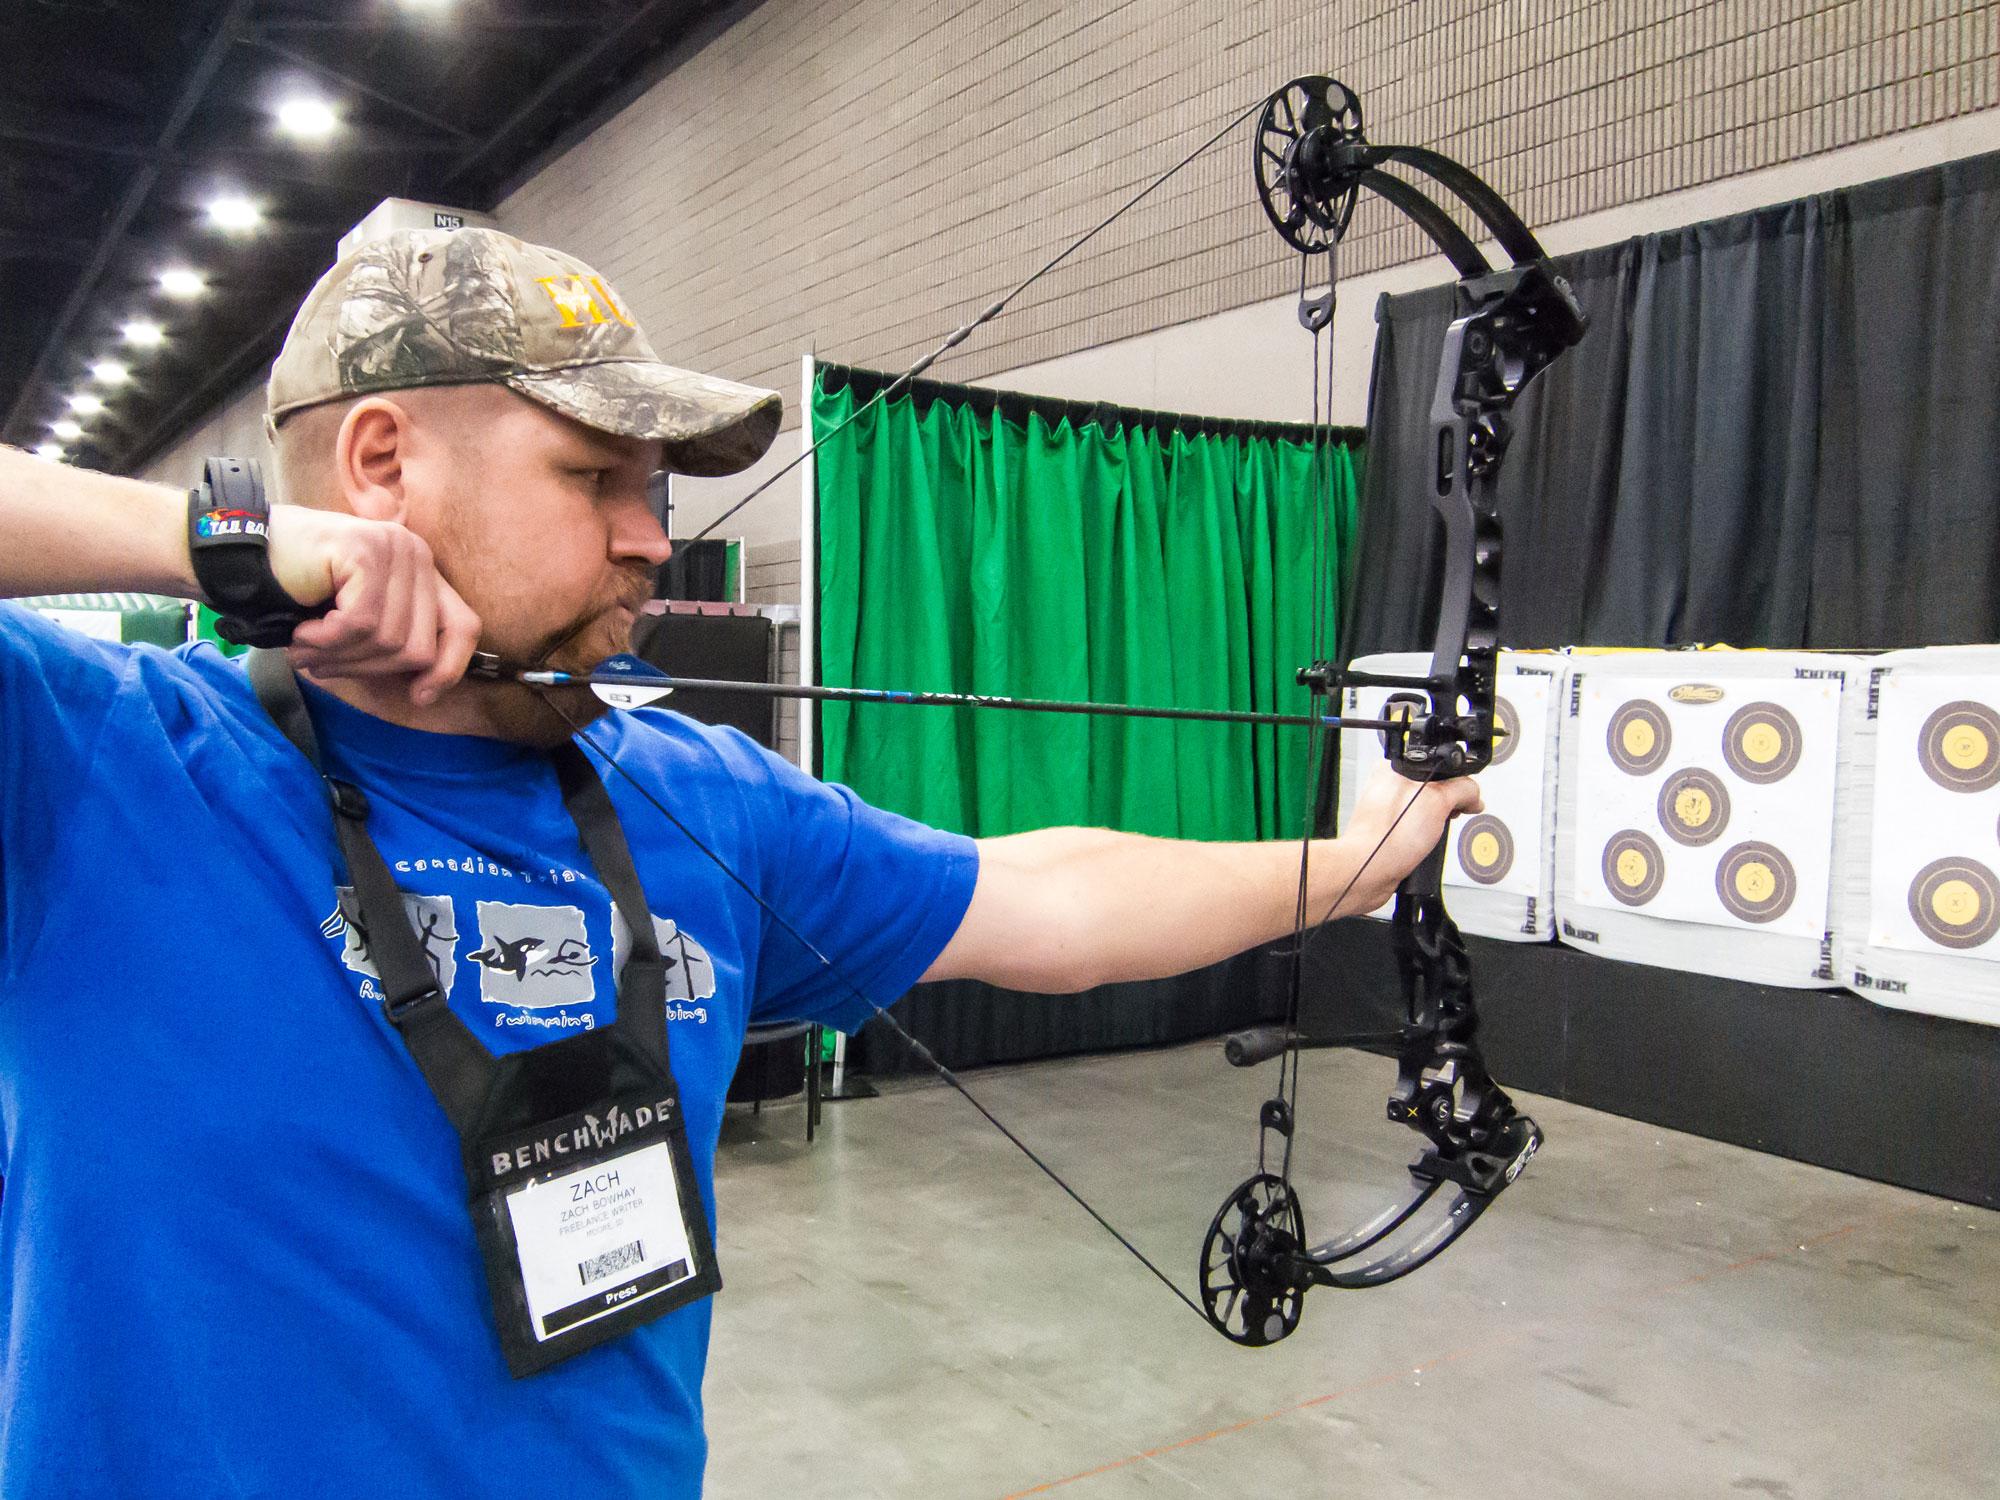 Zack Bowhay testing a new mathews bow